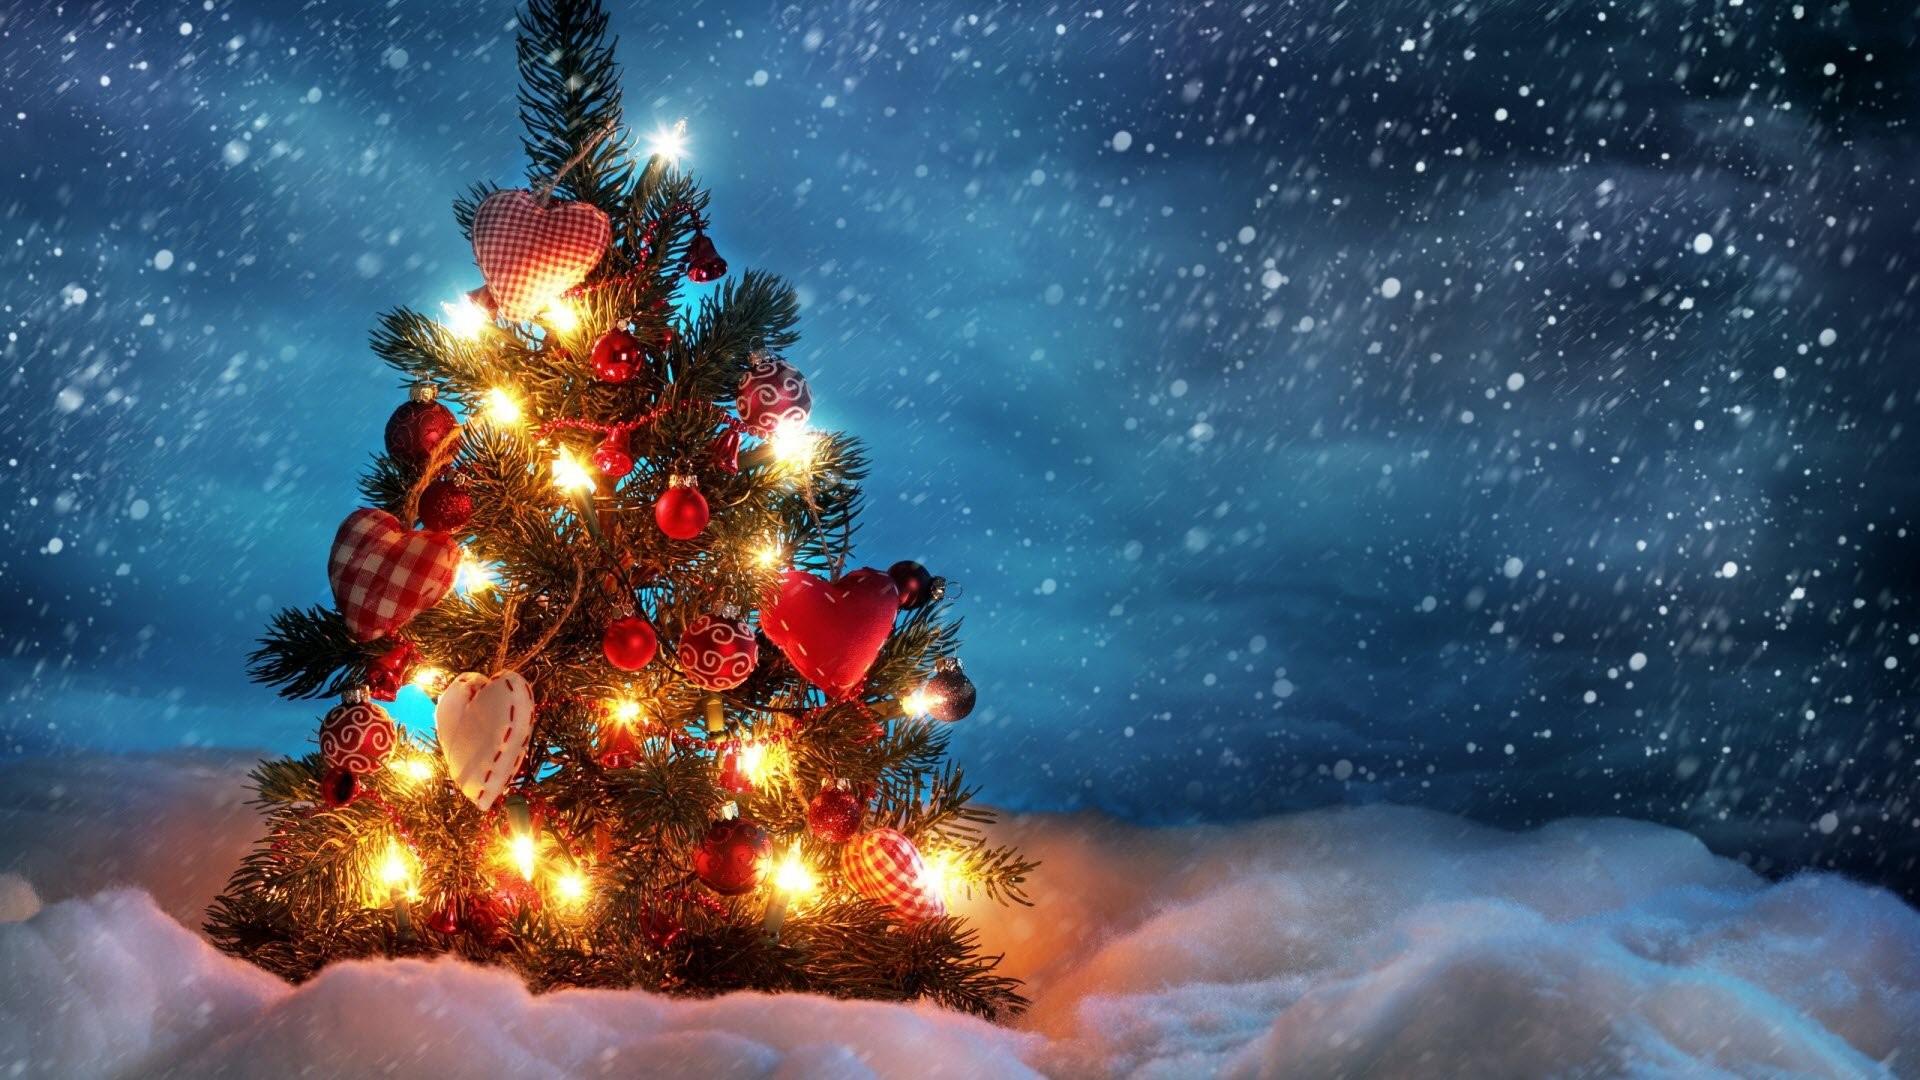 Christmas computer wallpaper – Cute Christmas Desktop Wallpapers